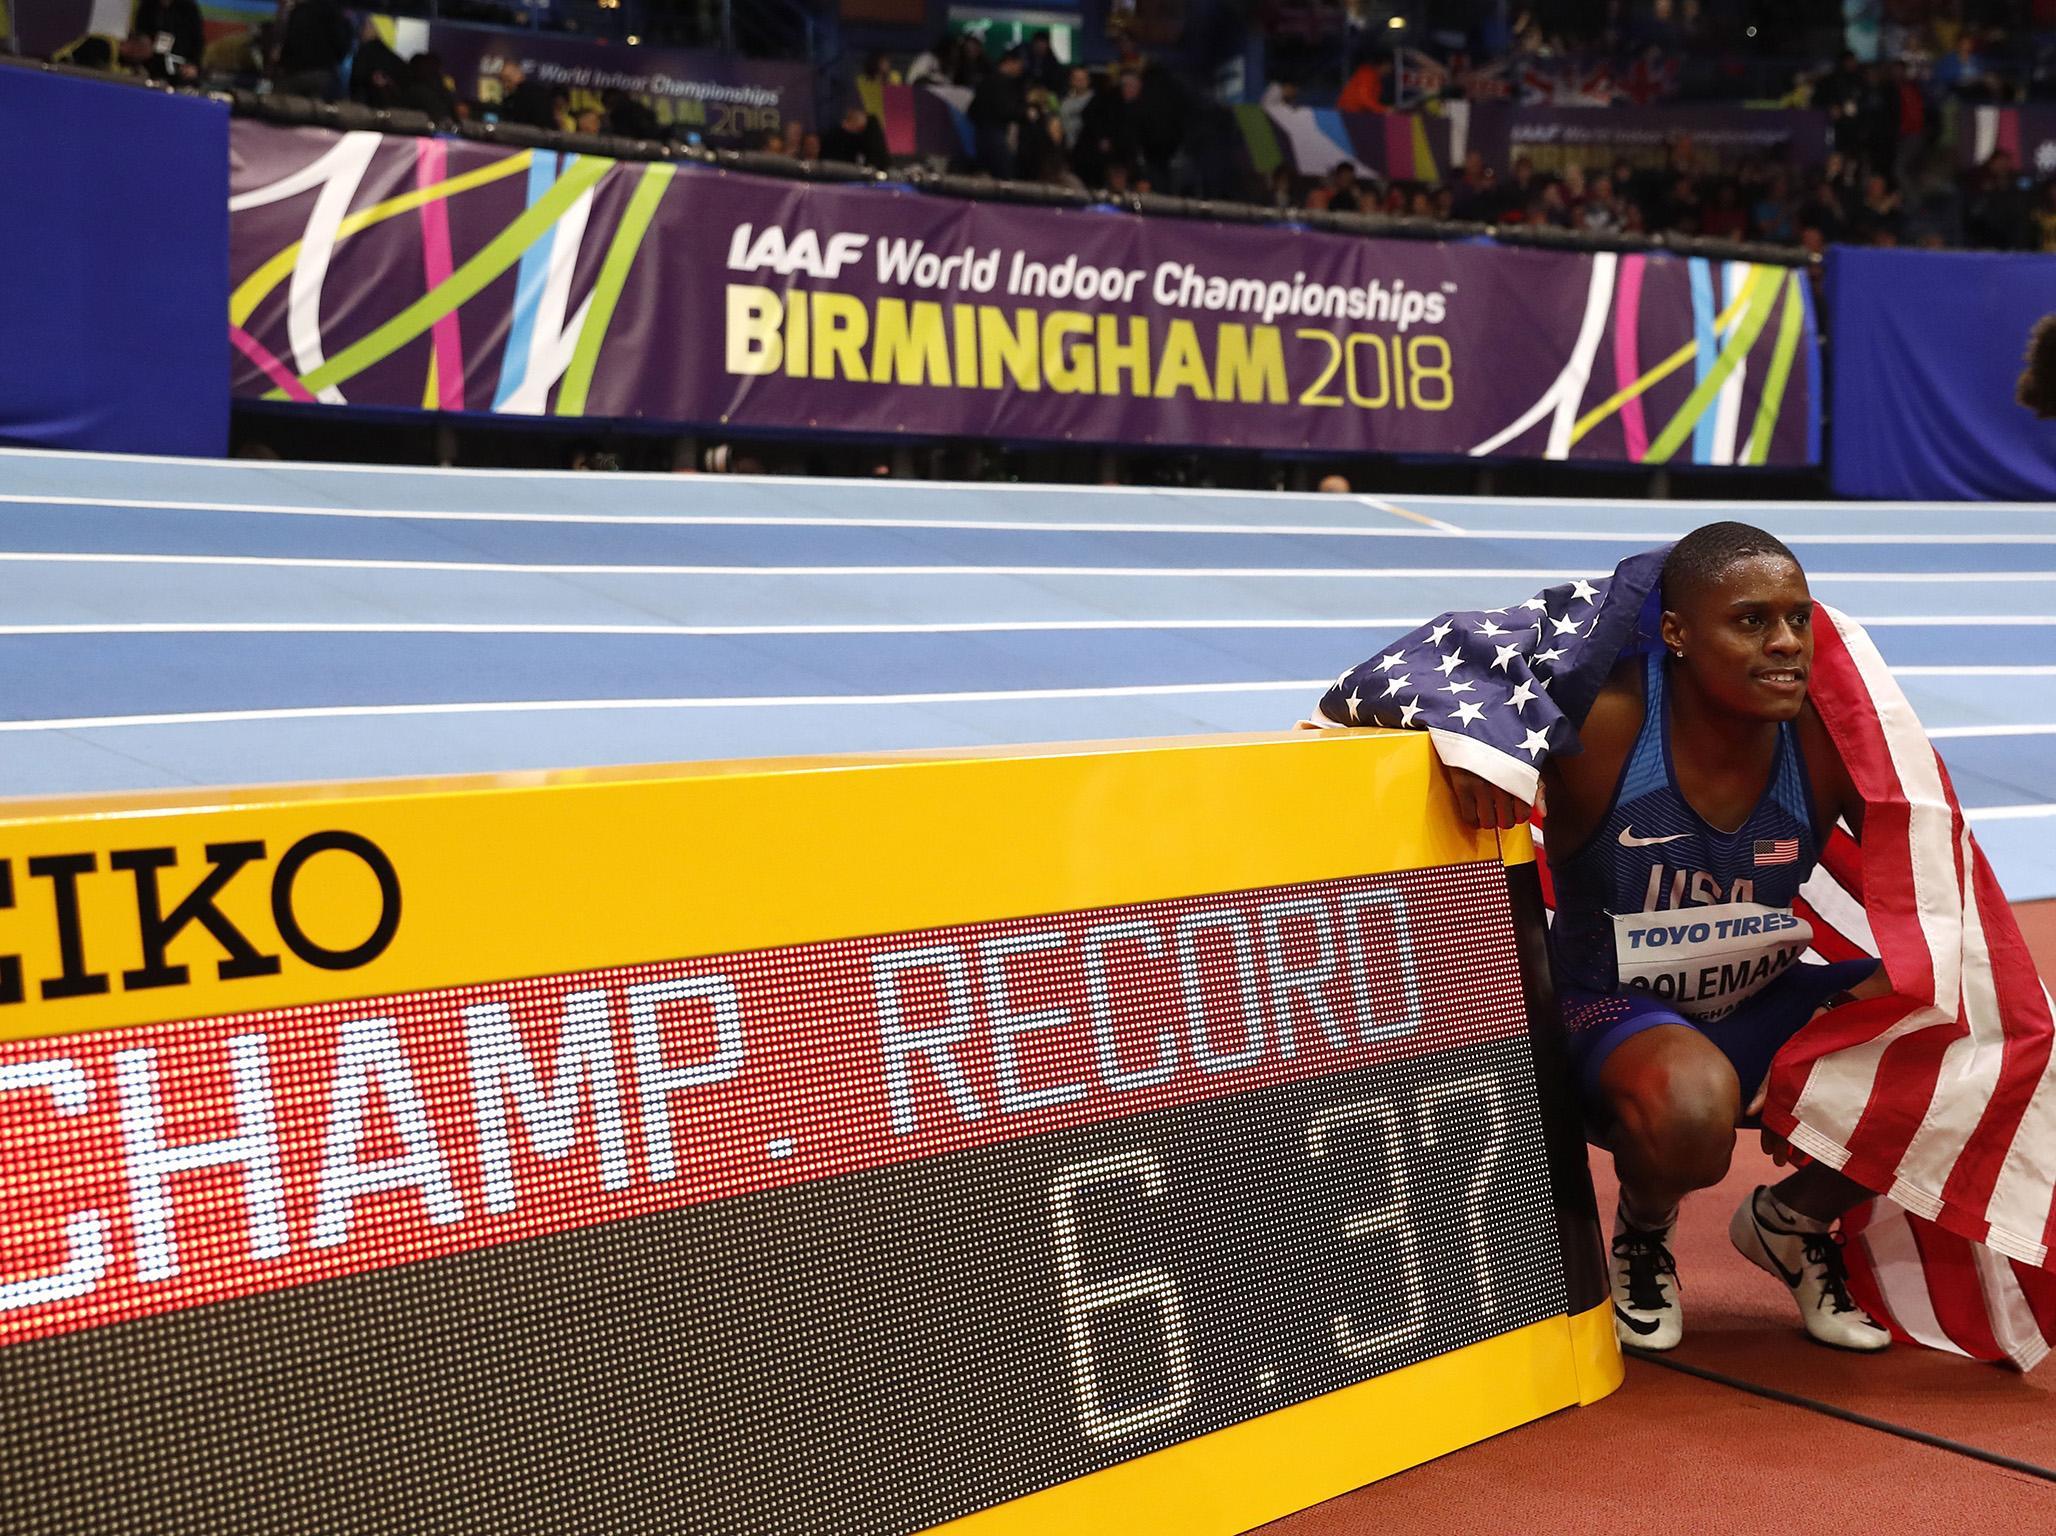 New British champion Ojie Edoburun criticises Christian Coleman after surprise 100 metres win